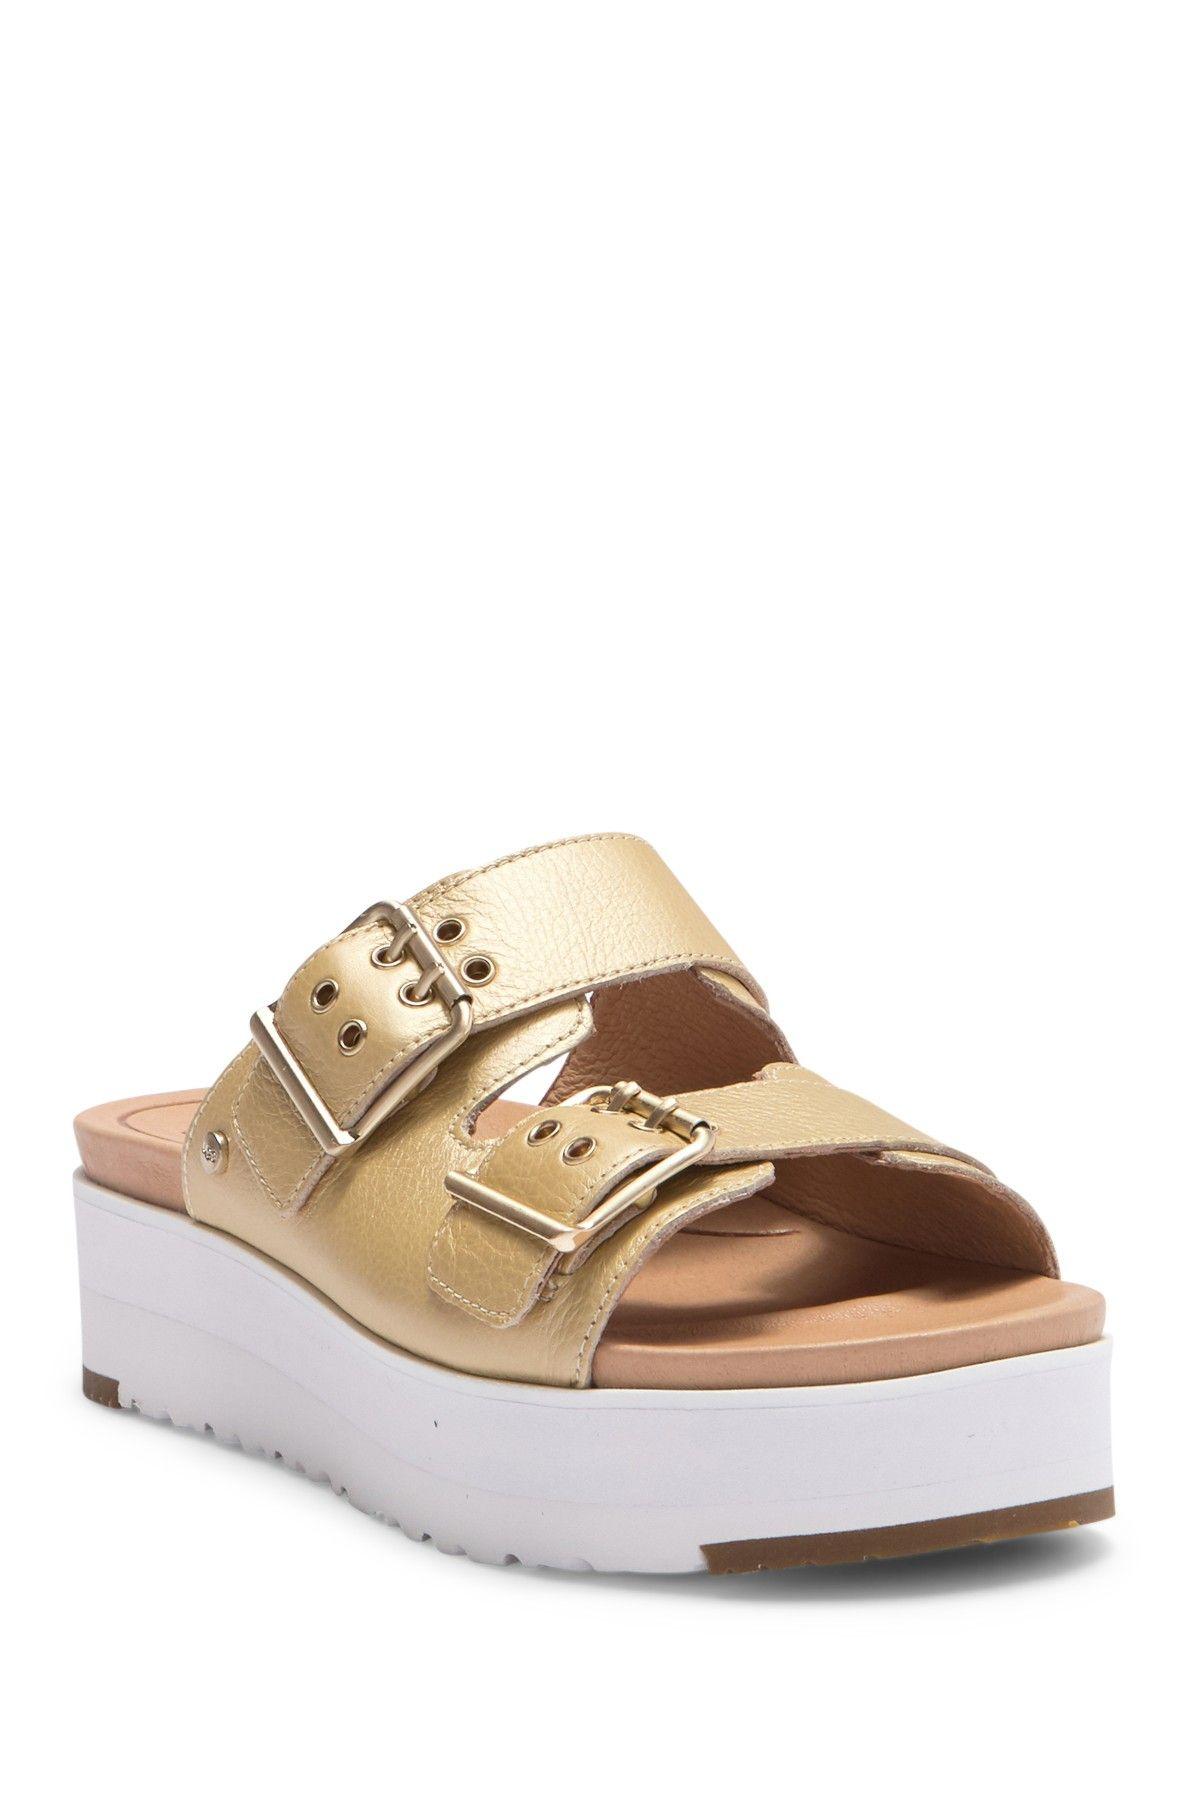 6f83fa18705 UGG | Cammie Metallic Leather Platform Sandal in 2019 | want ...